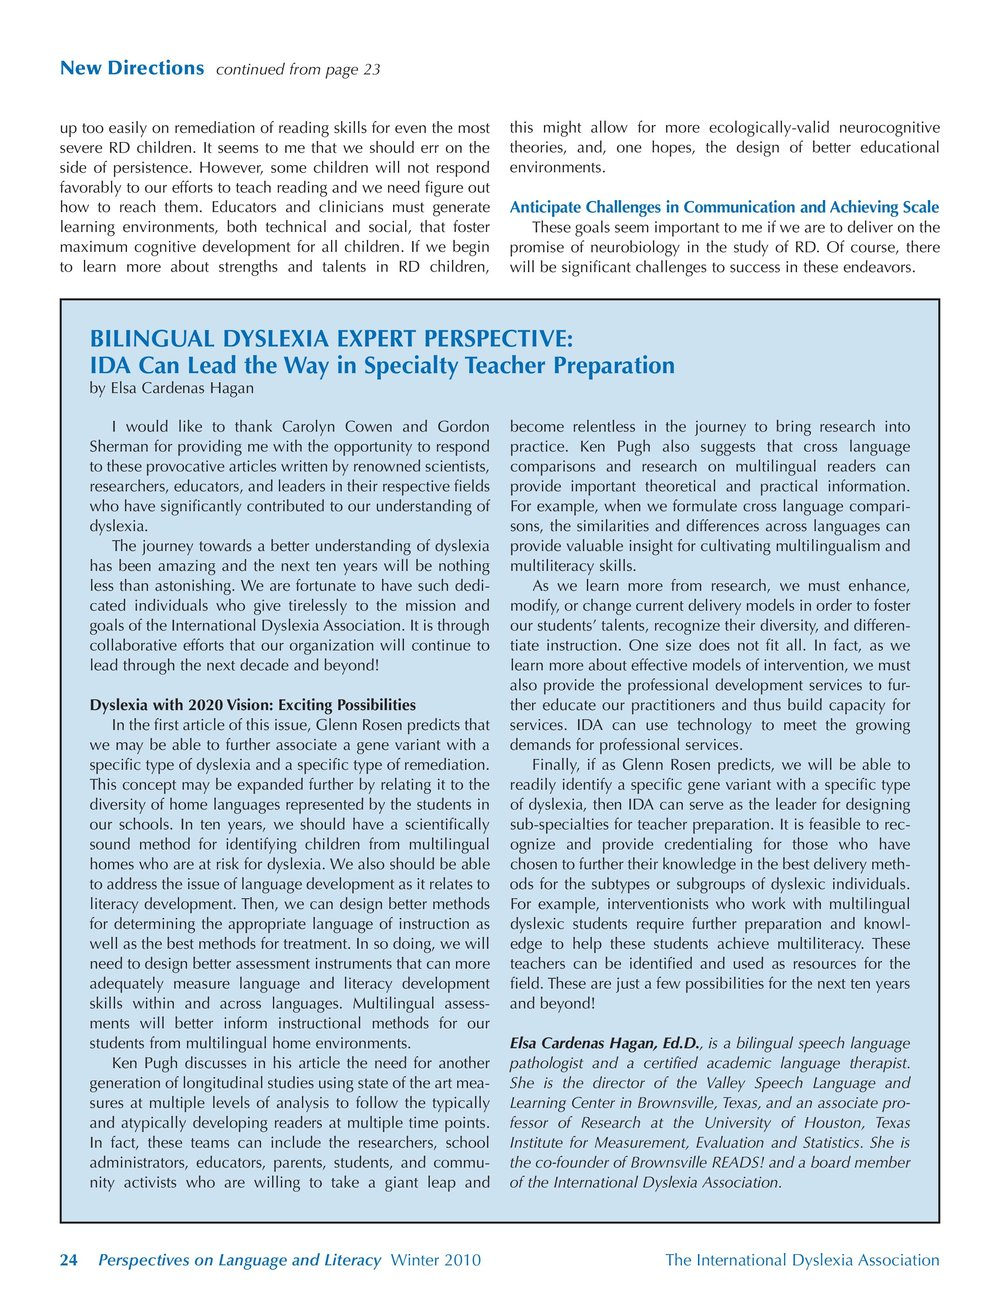 Pugh IDA perspectives (1)-page-003.jpg